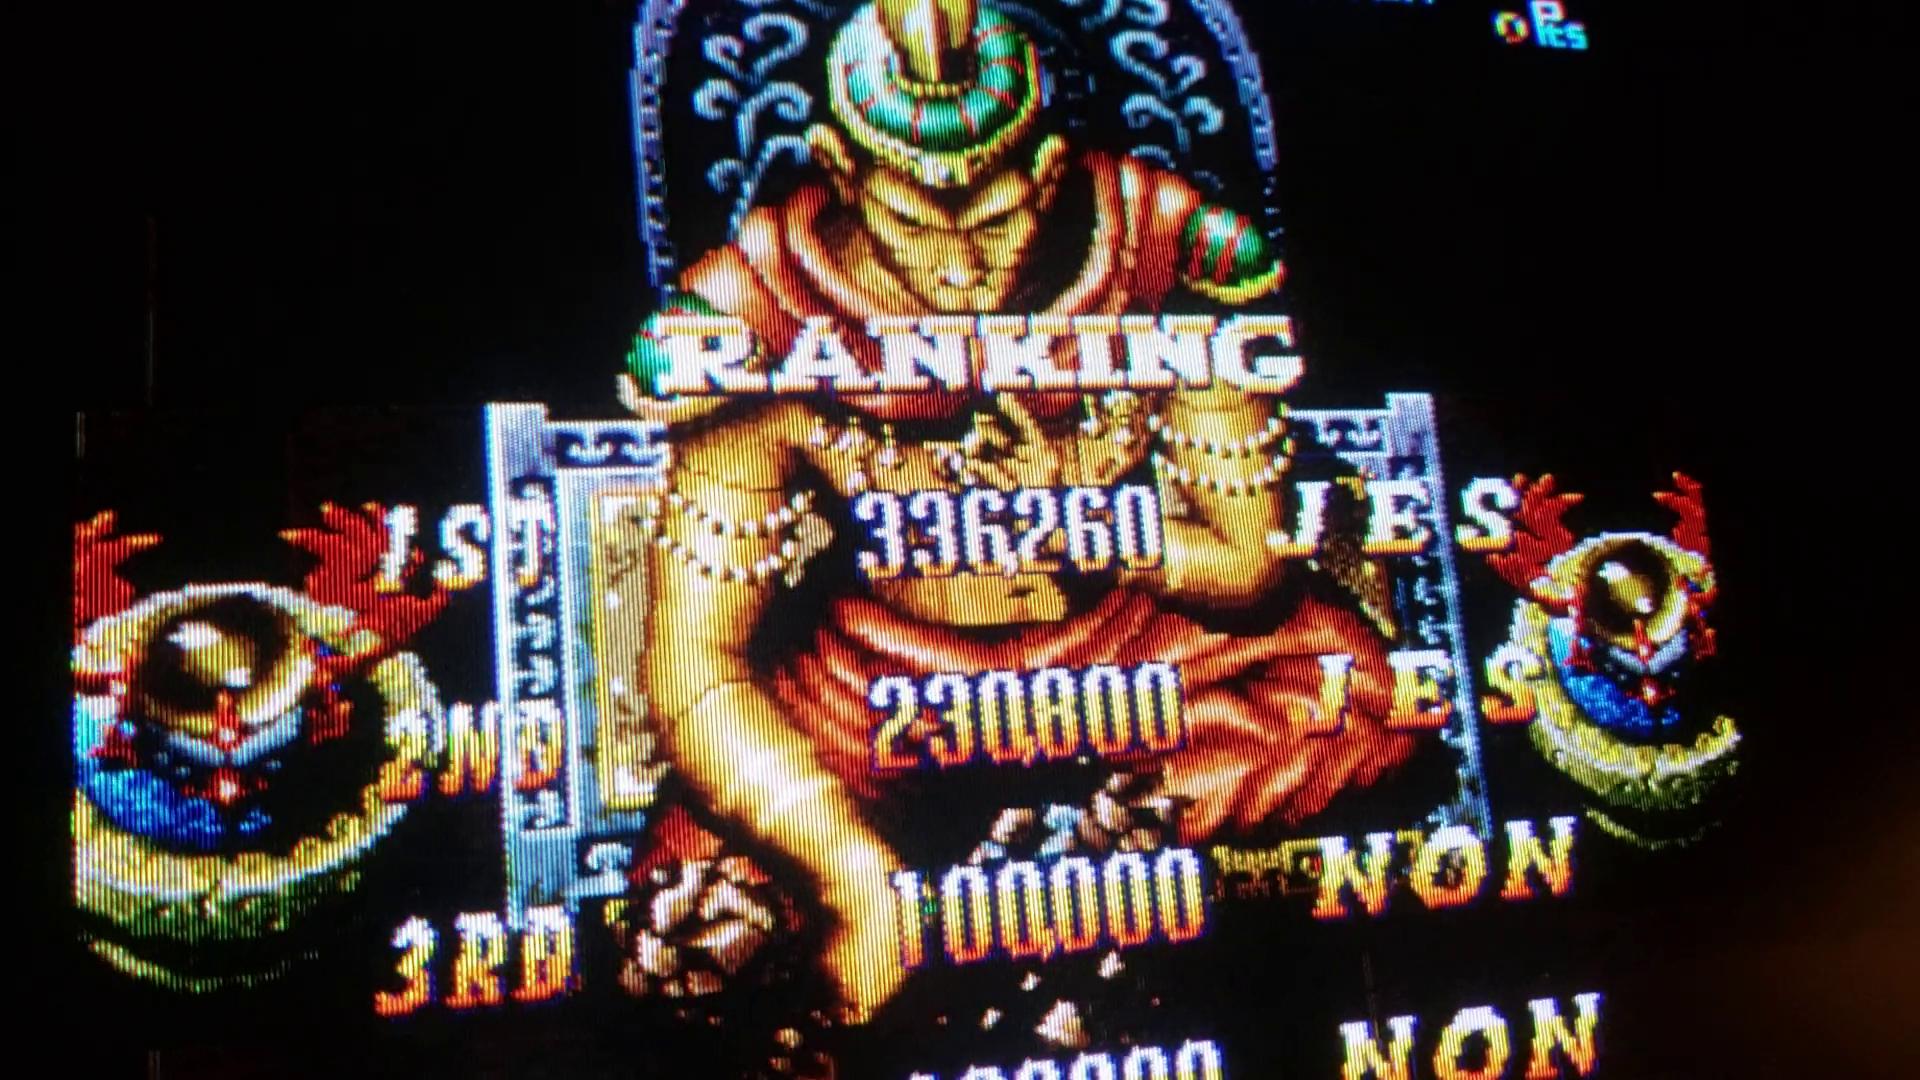 JES: Gundhara: Juudan Arashi [gundhara] (Arcade Emulated / M.A.M.E.) 336,260 points on 2019-10-13 01:51:53